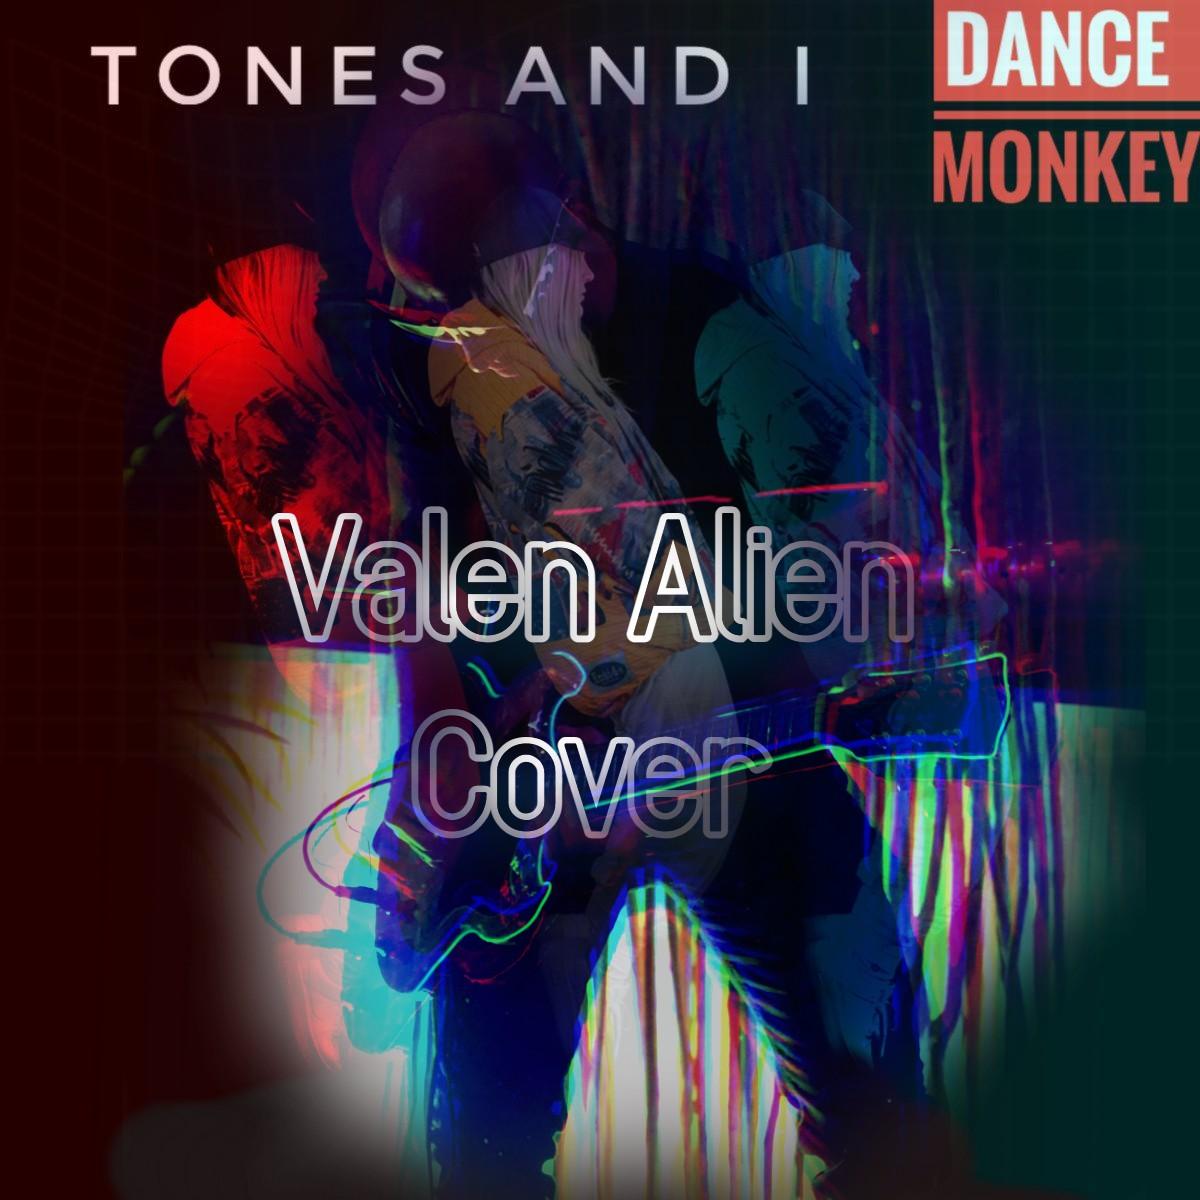 Tones-I-Dance-Monkey-